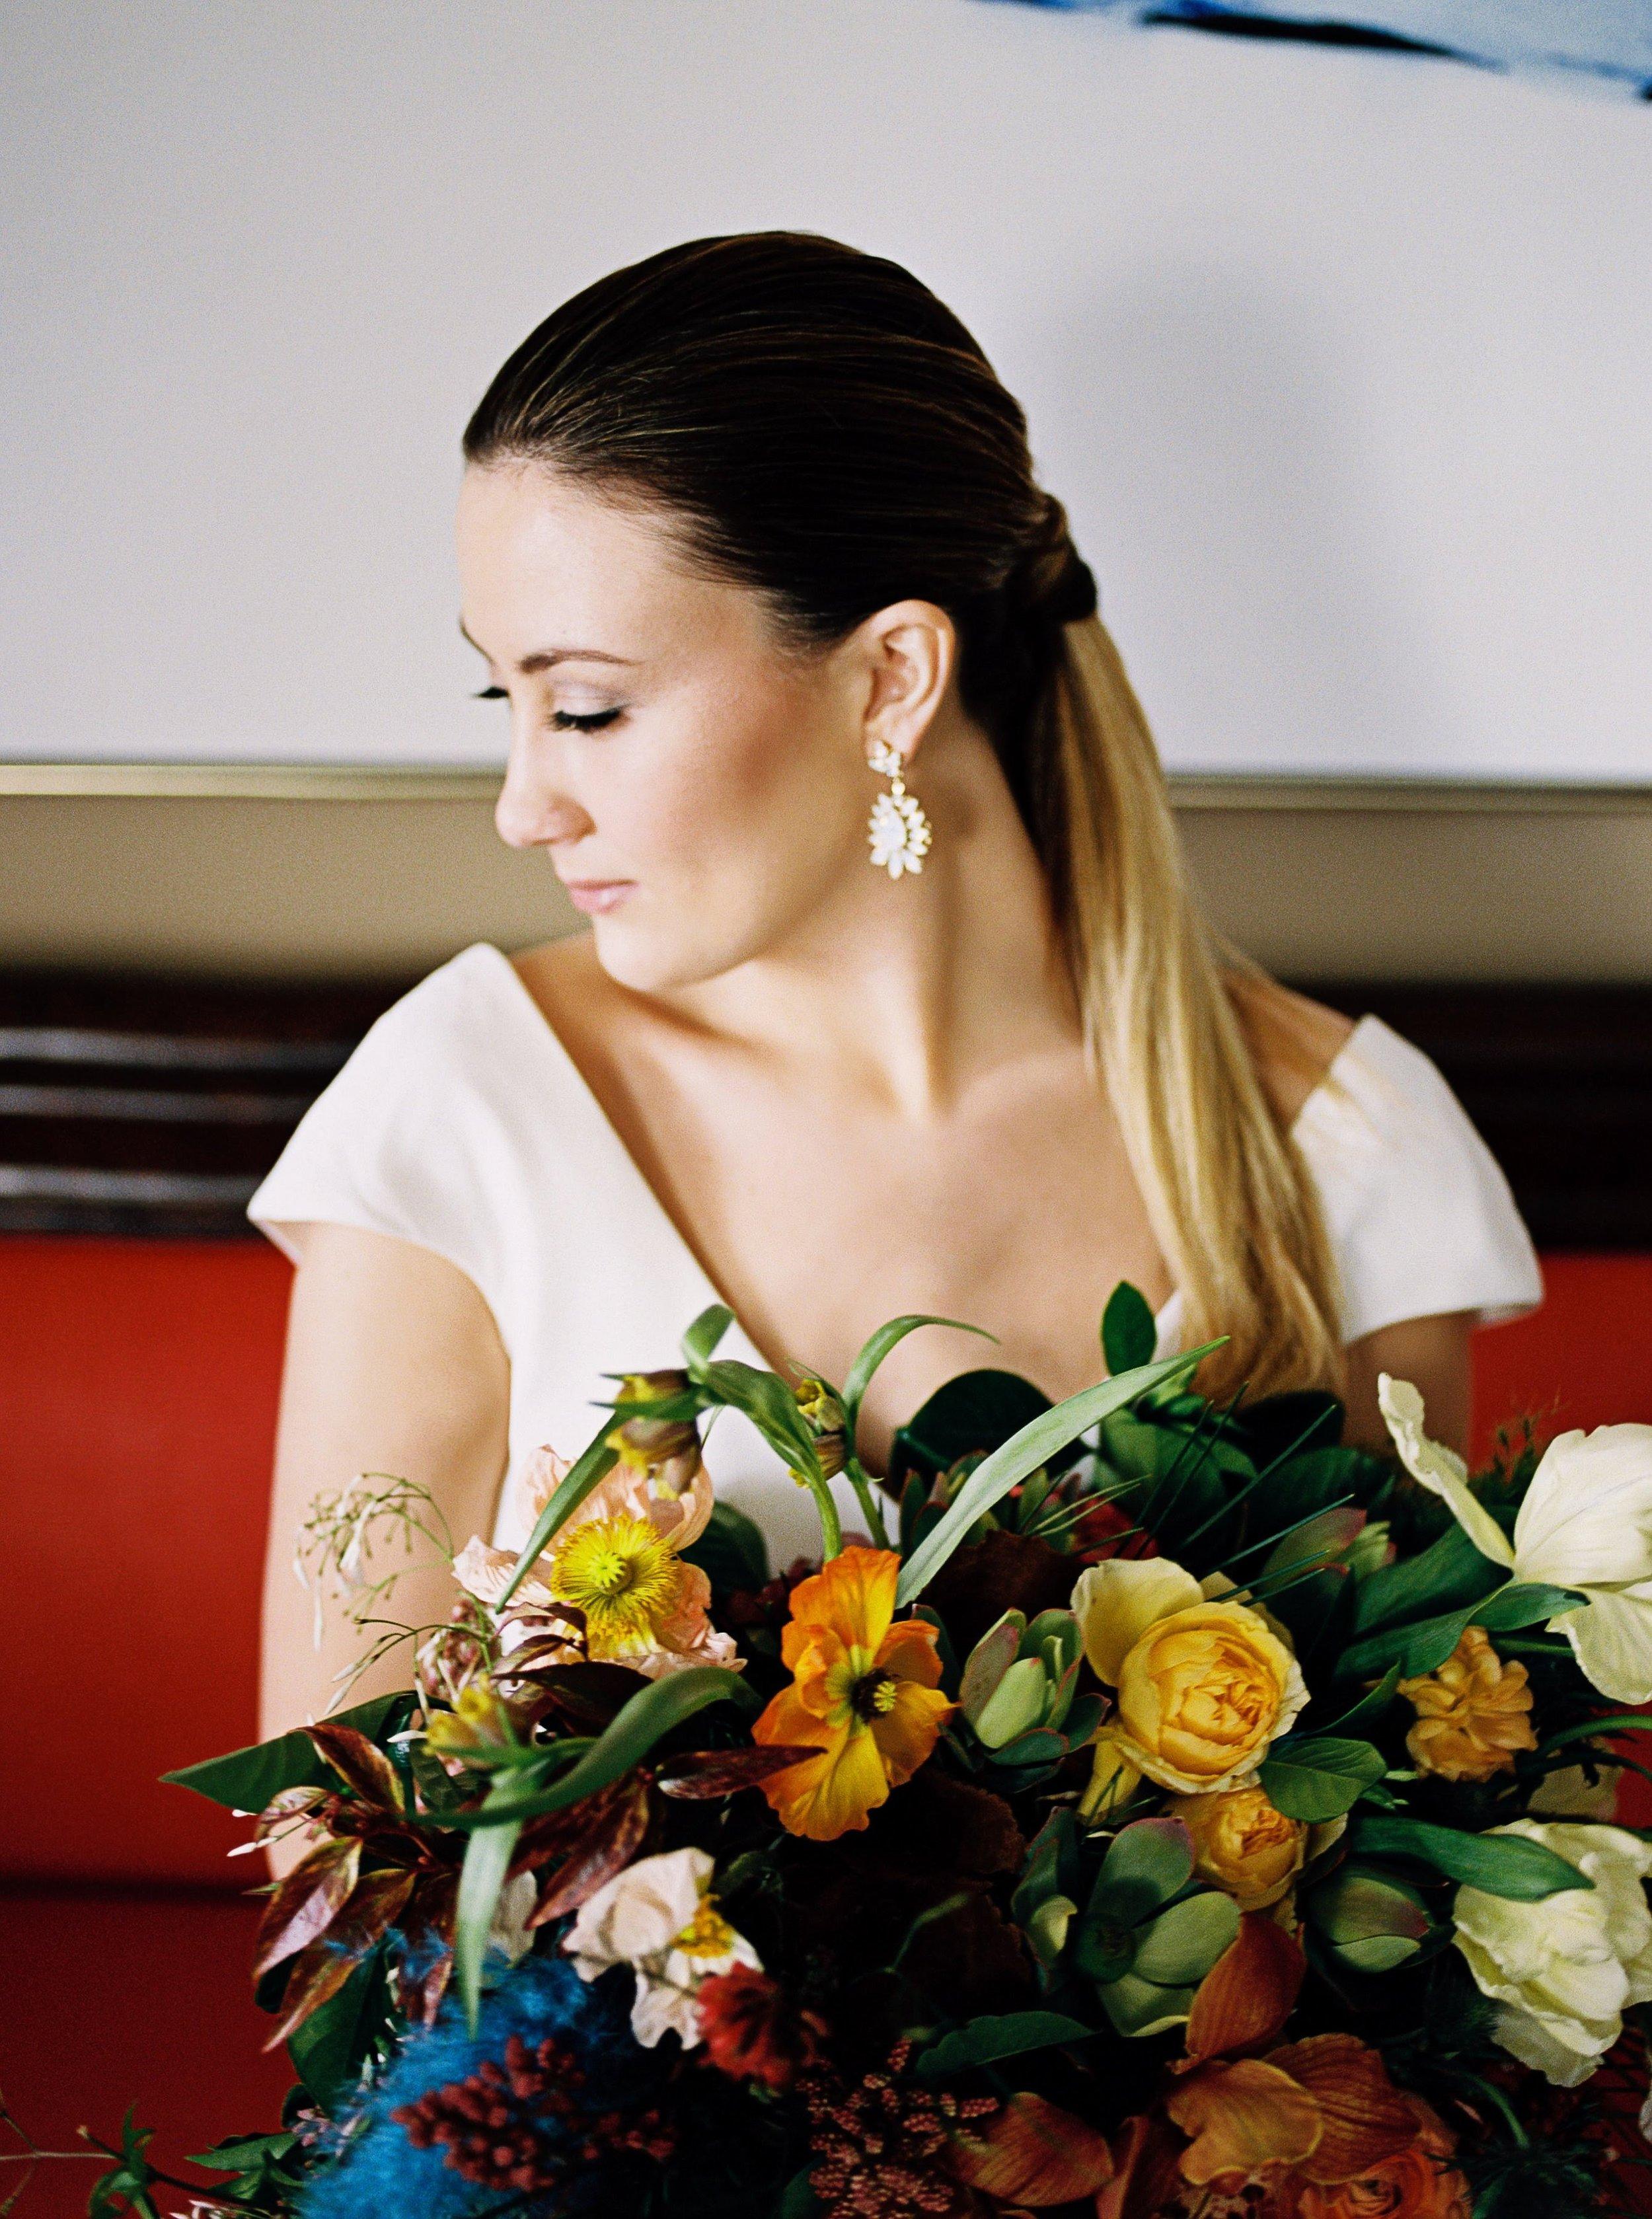 Alexandra-Elise-Photography-Ali-Reed-Rowland-House-Styled-Shoot-064.jpg